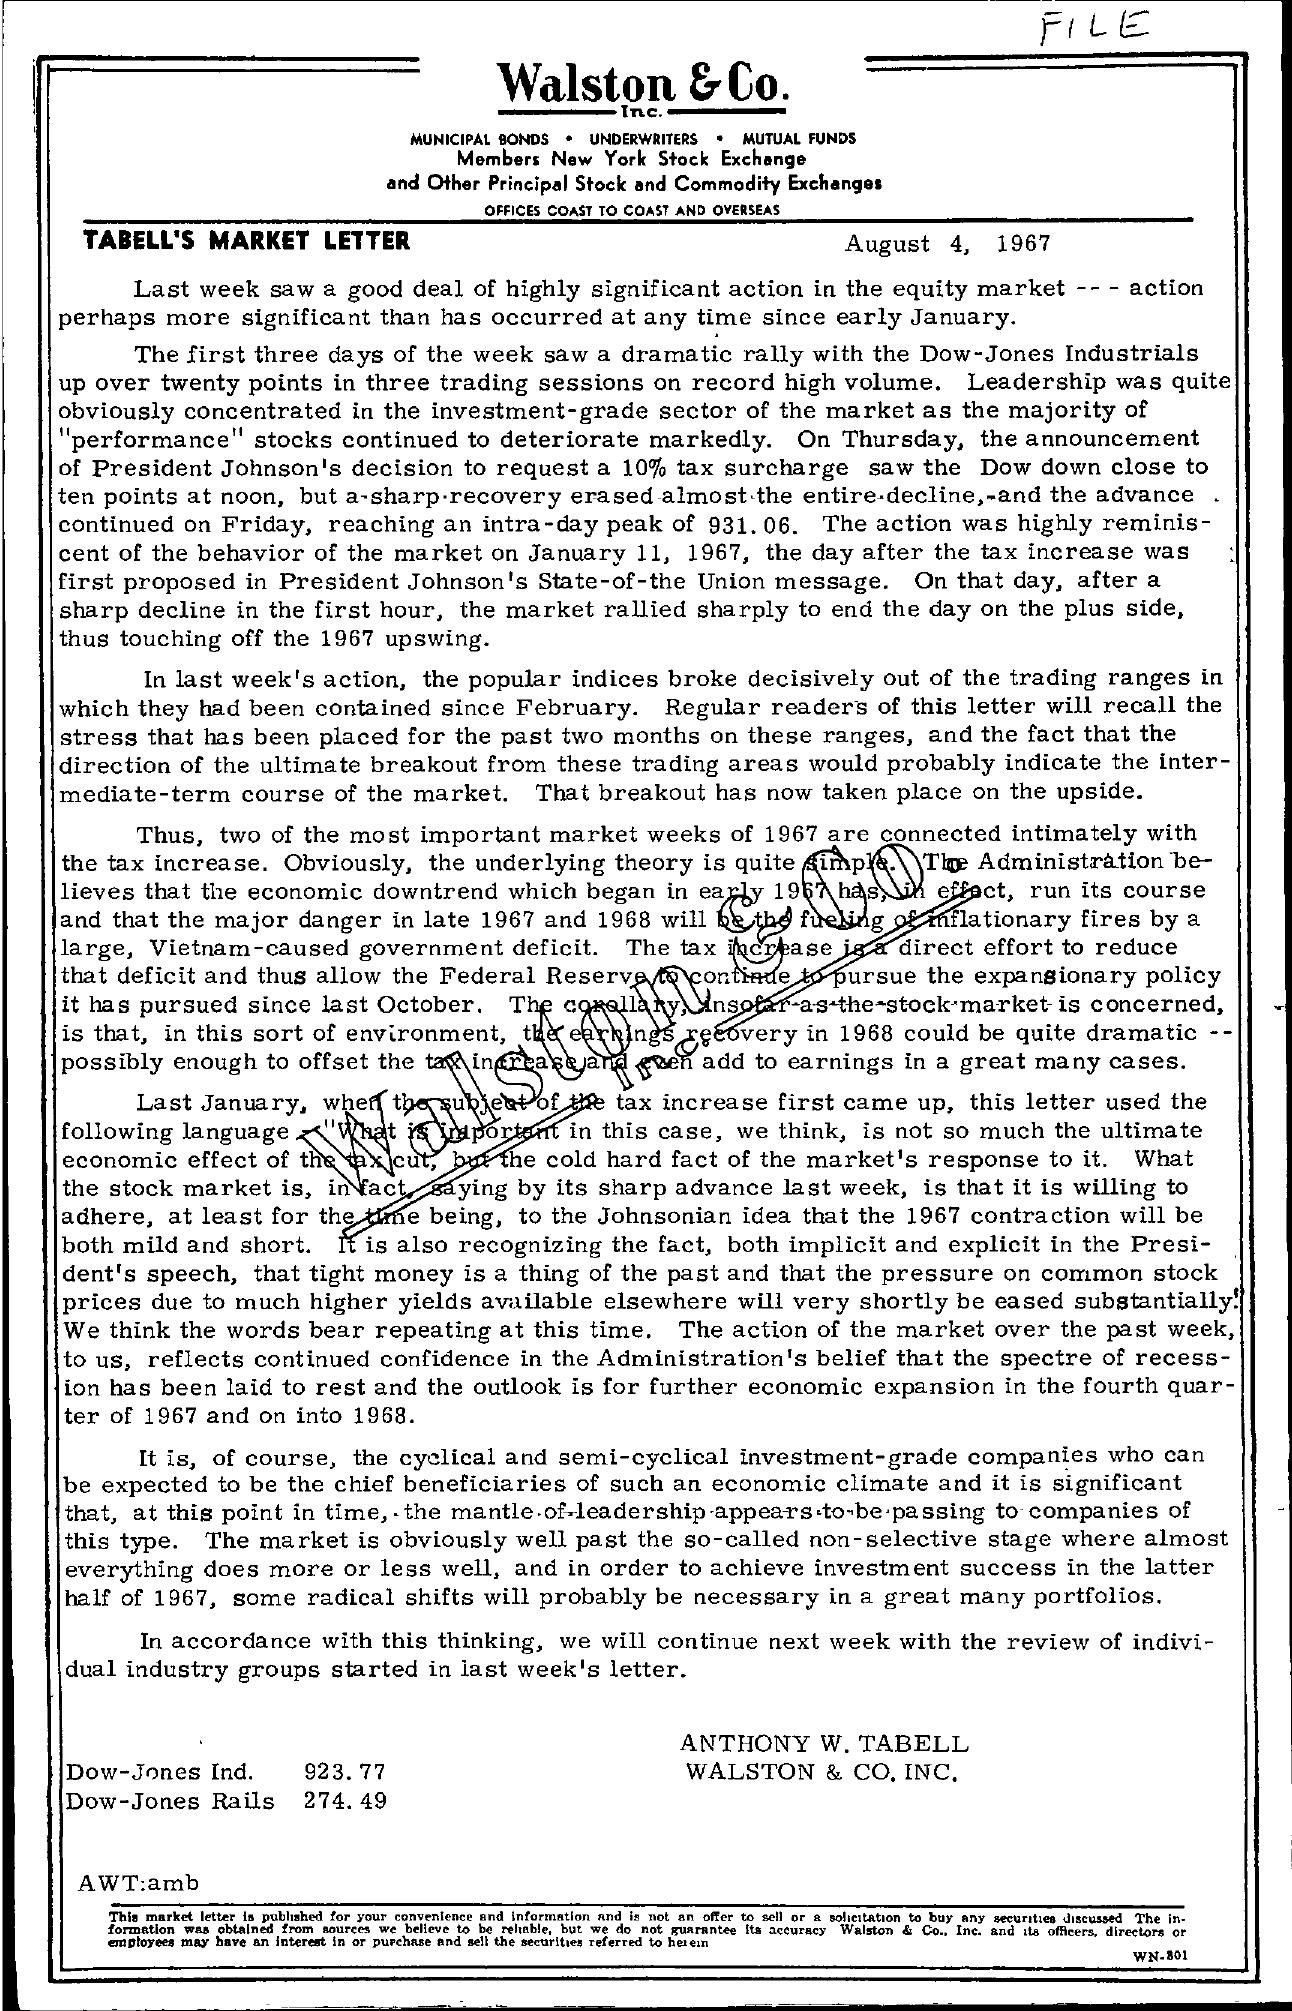 Tabell's Market Letter - August 04, 1967